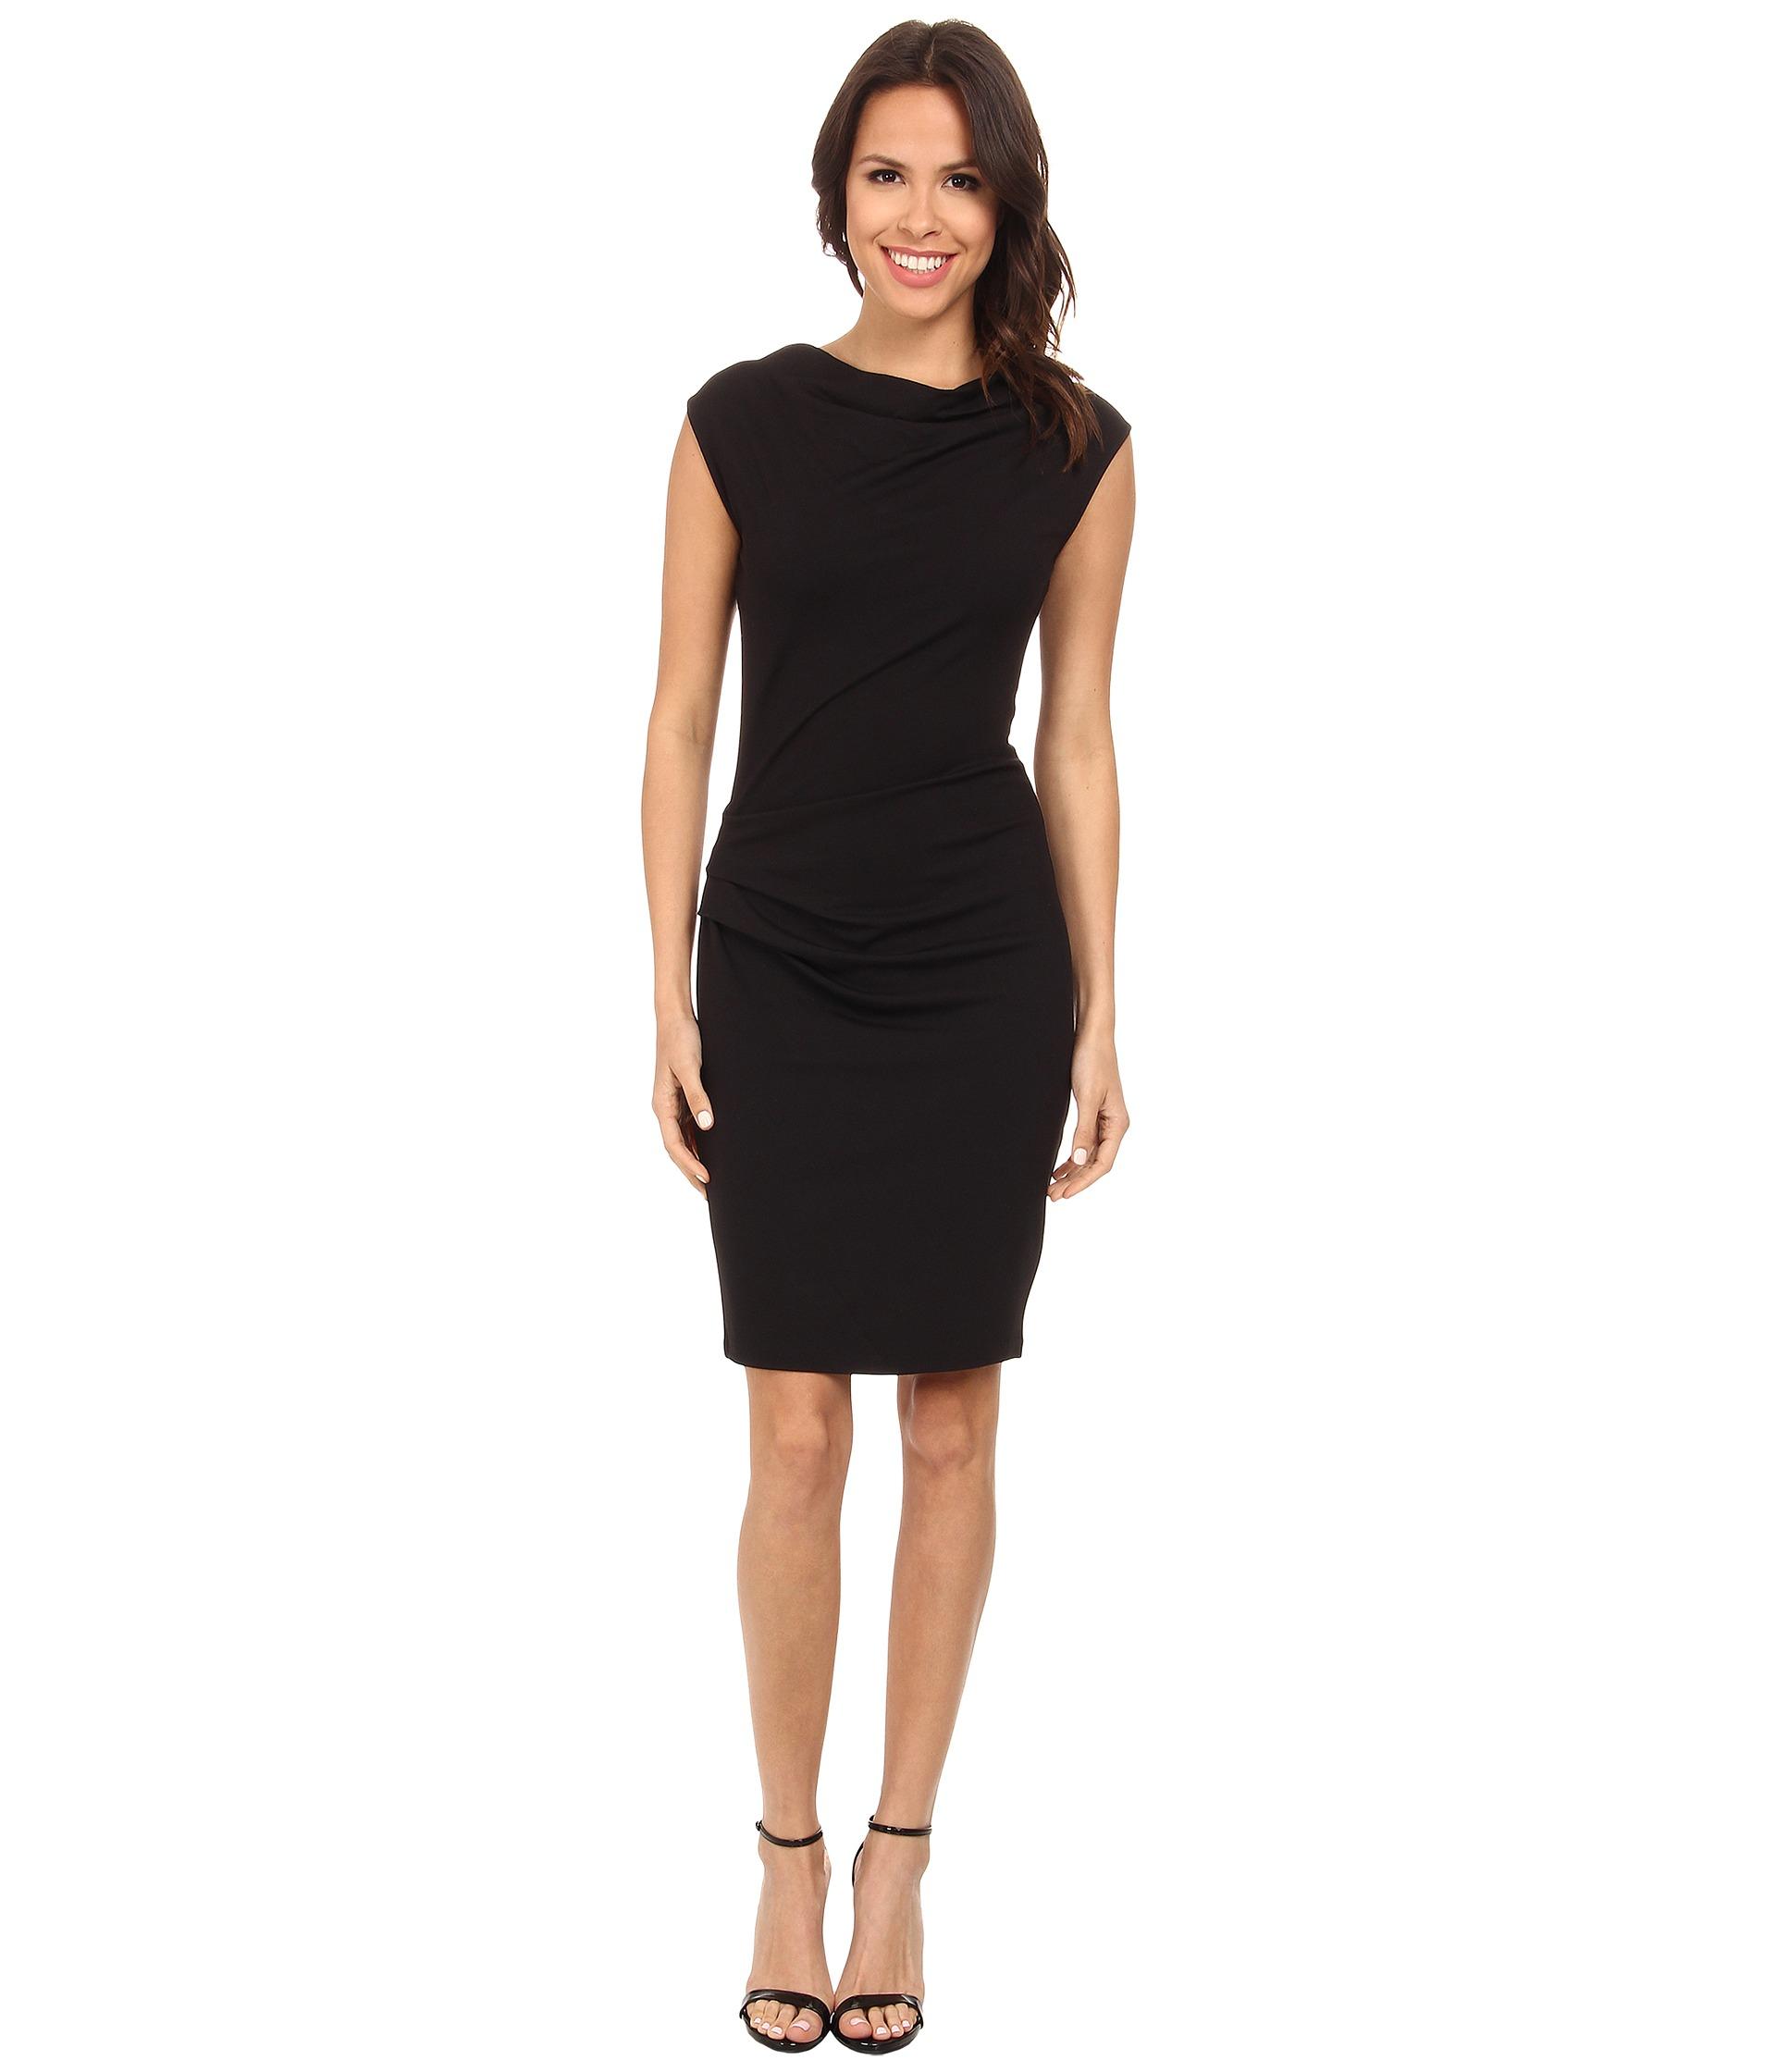 Asymmetric Drape Dress: Dkny Asymmetric Draped Dress In Black